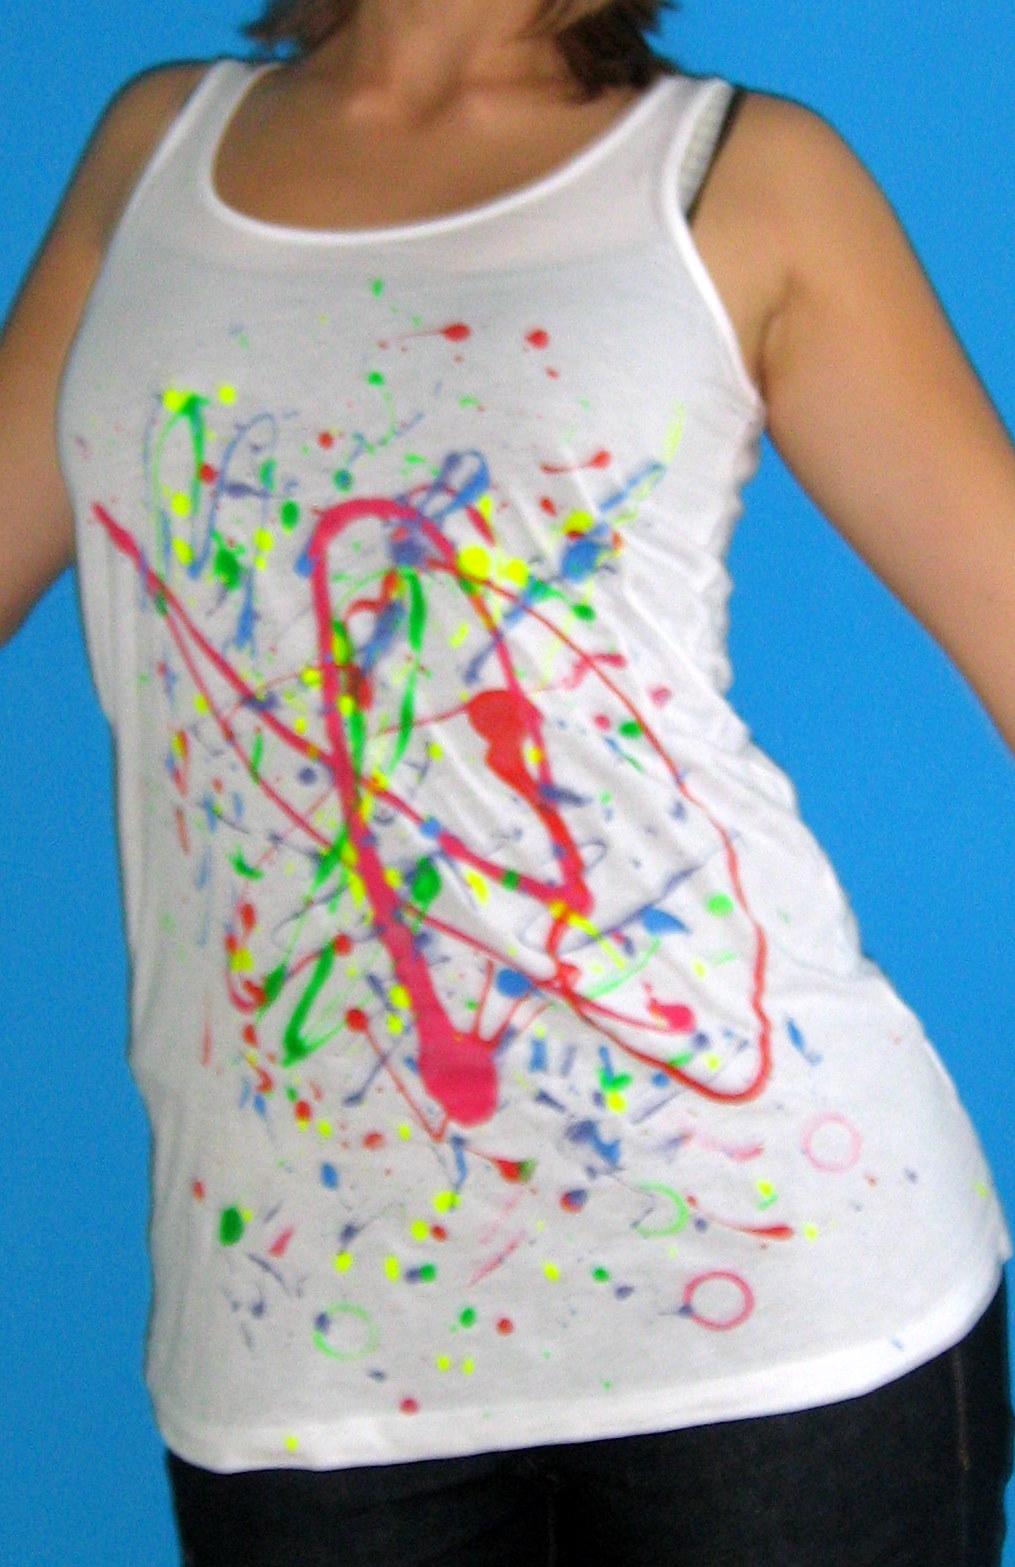 Zeer Seriously Funny Girl: Pimp je t-shirt! OB69